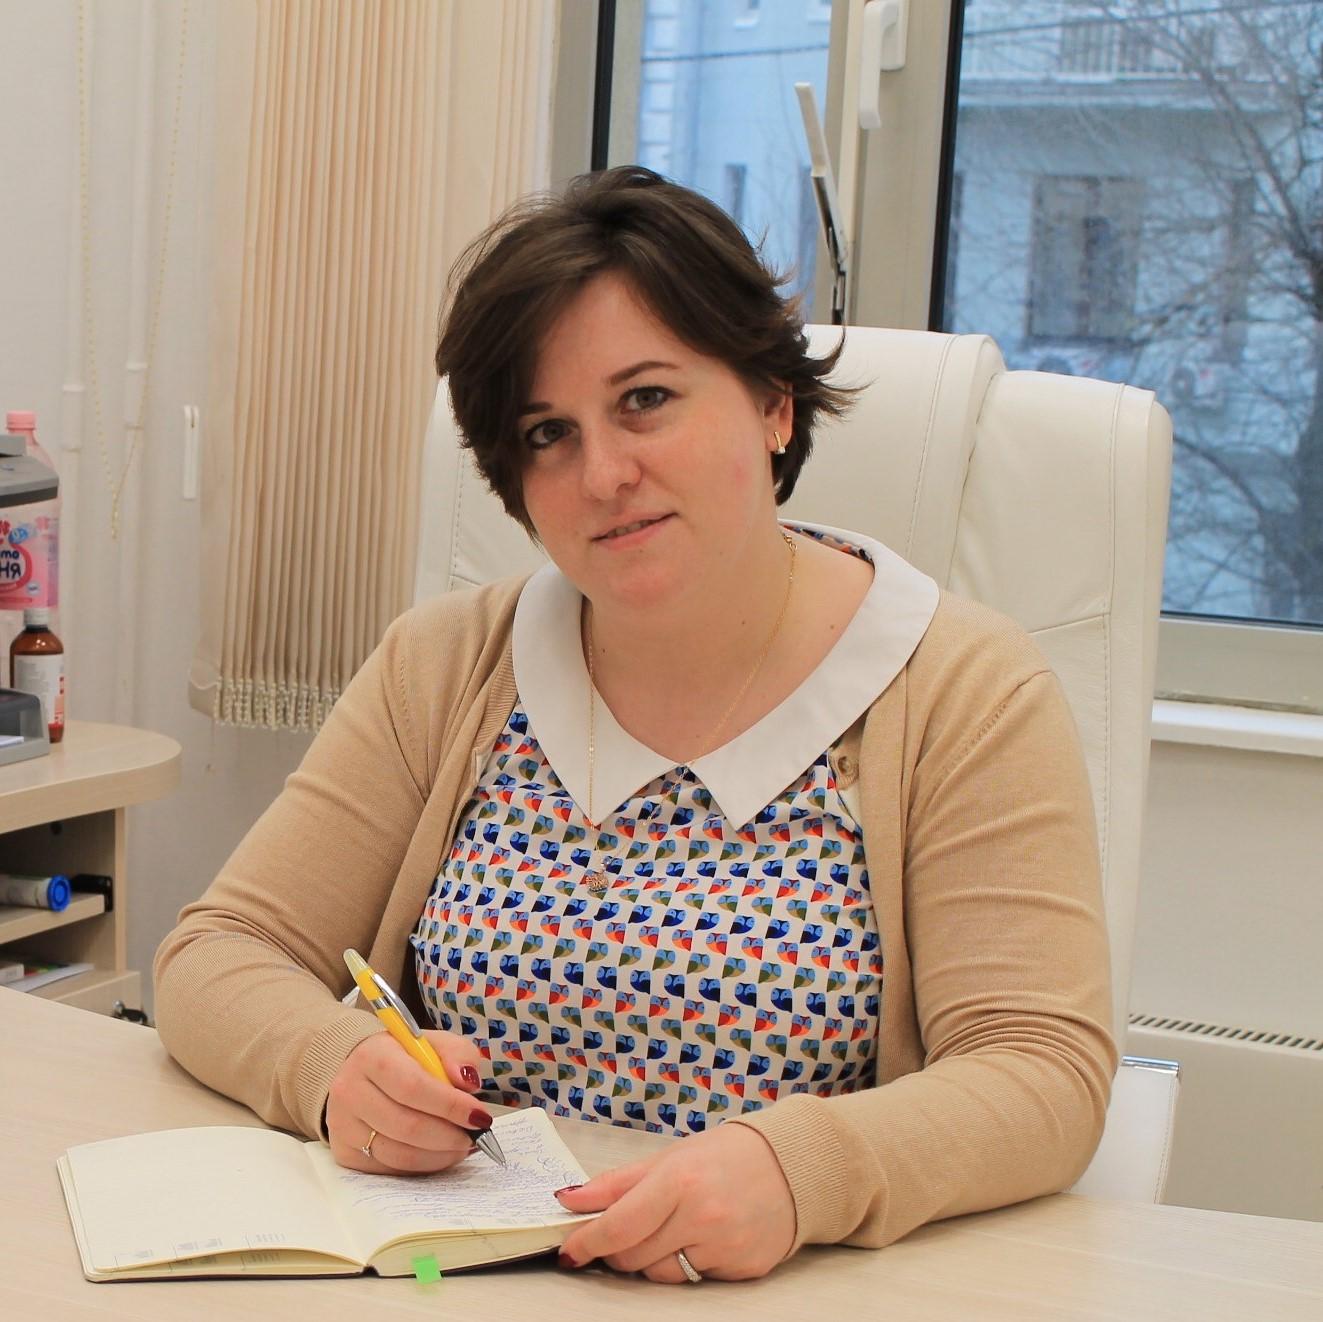 Daria Milyaeva